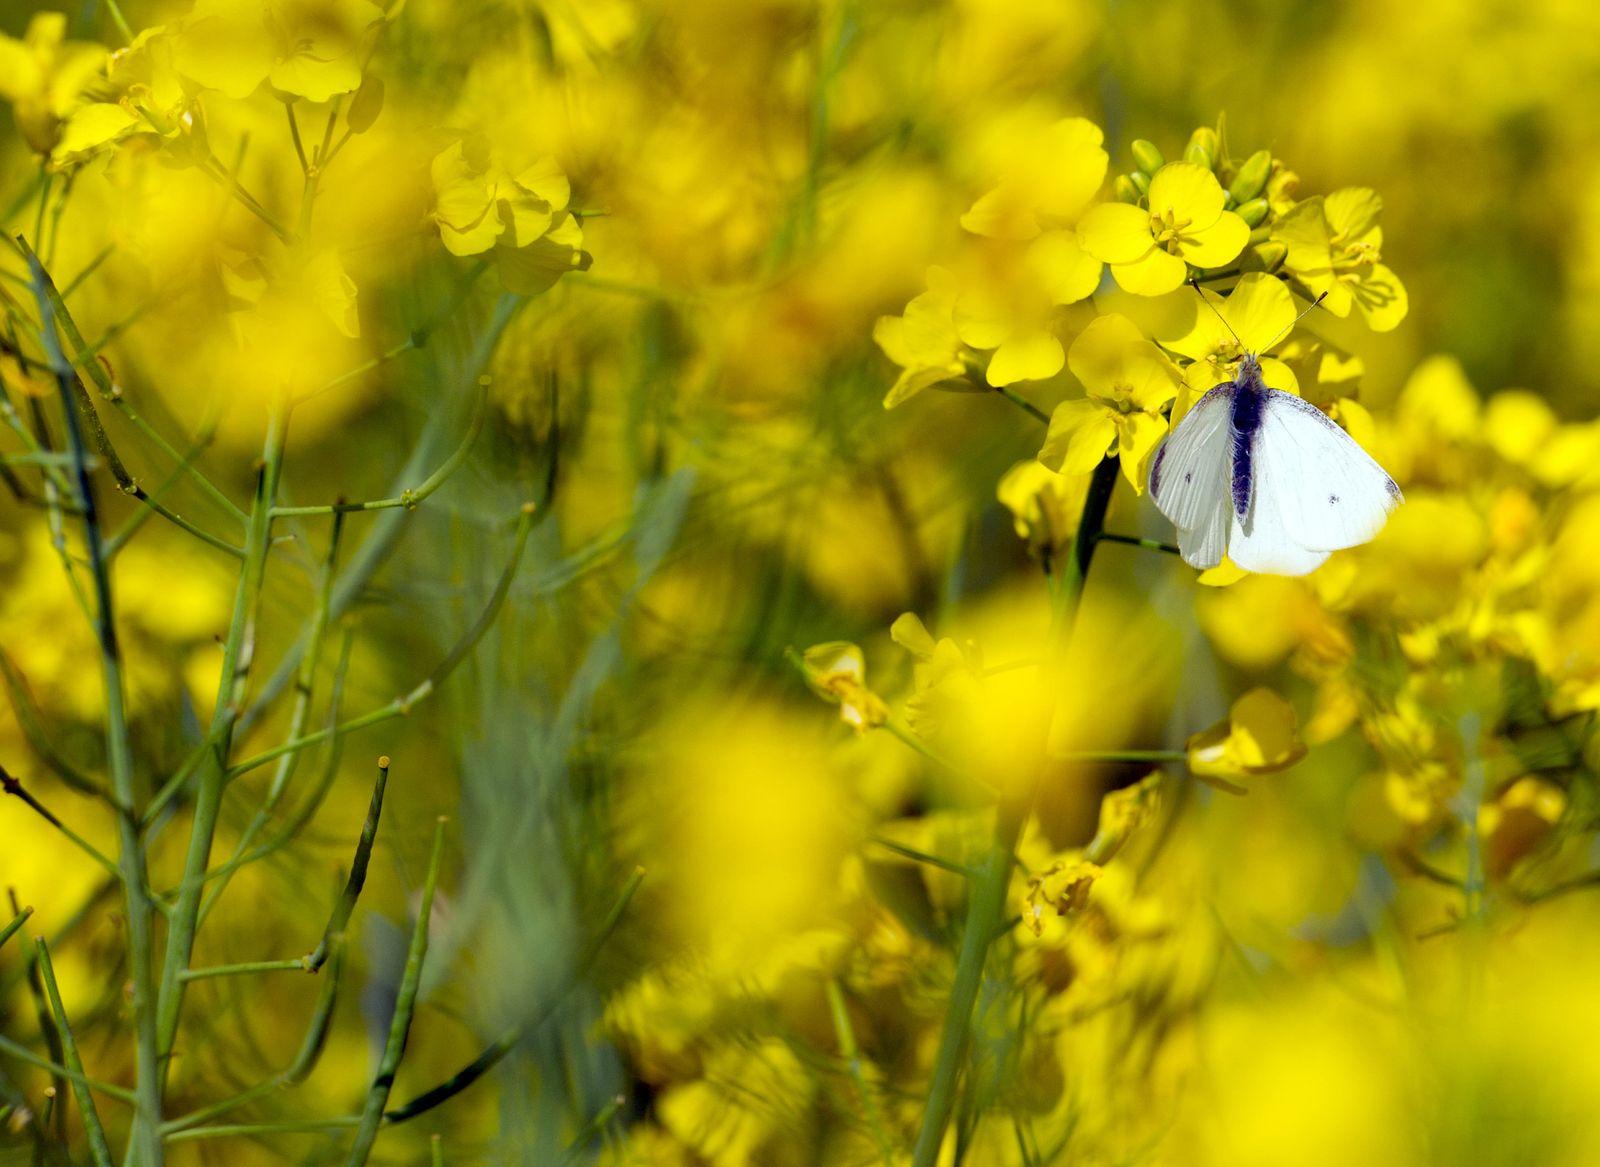 Schmetterling/ Rapsblüte/ Nikotinoide